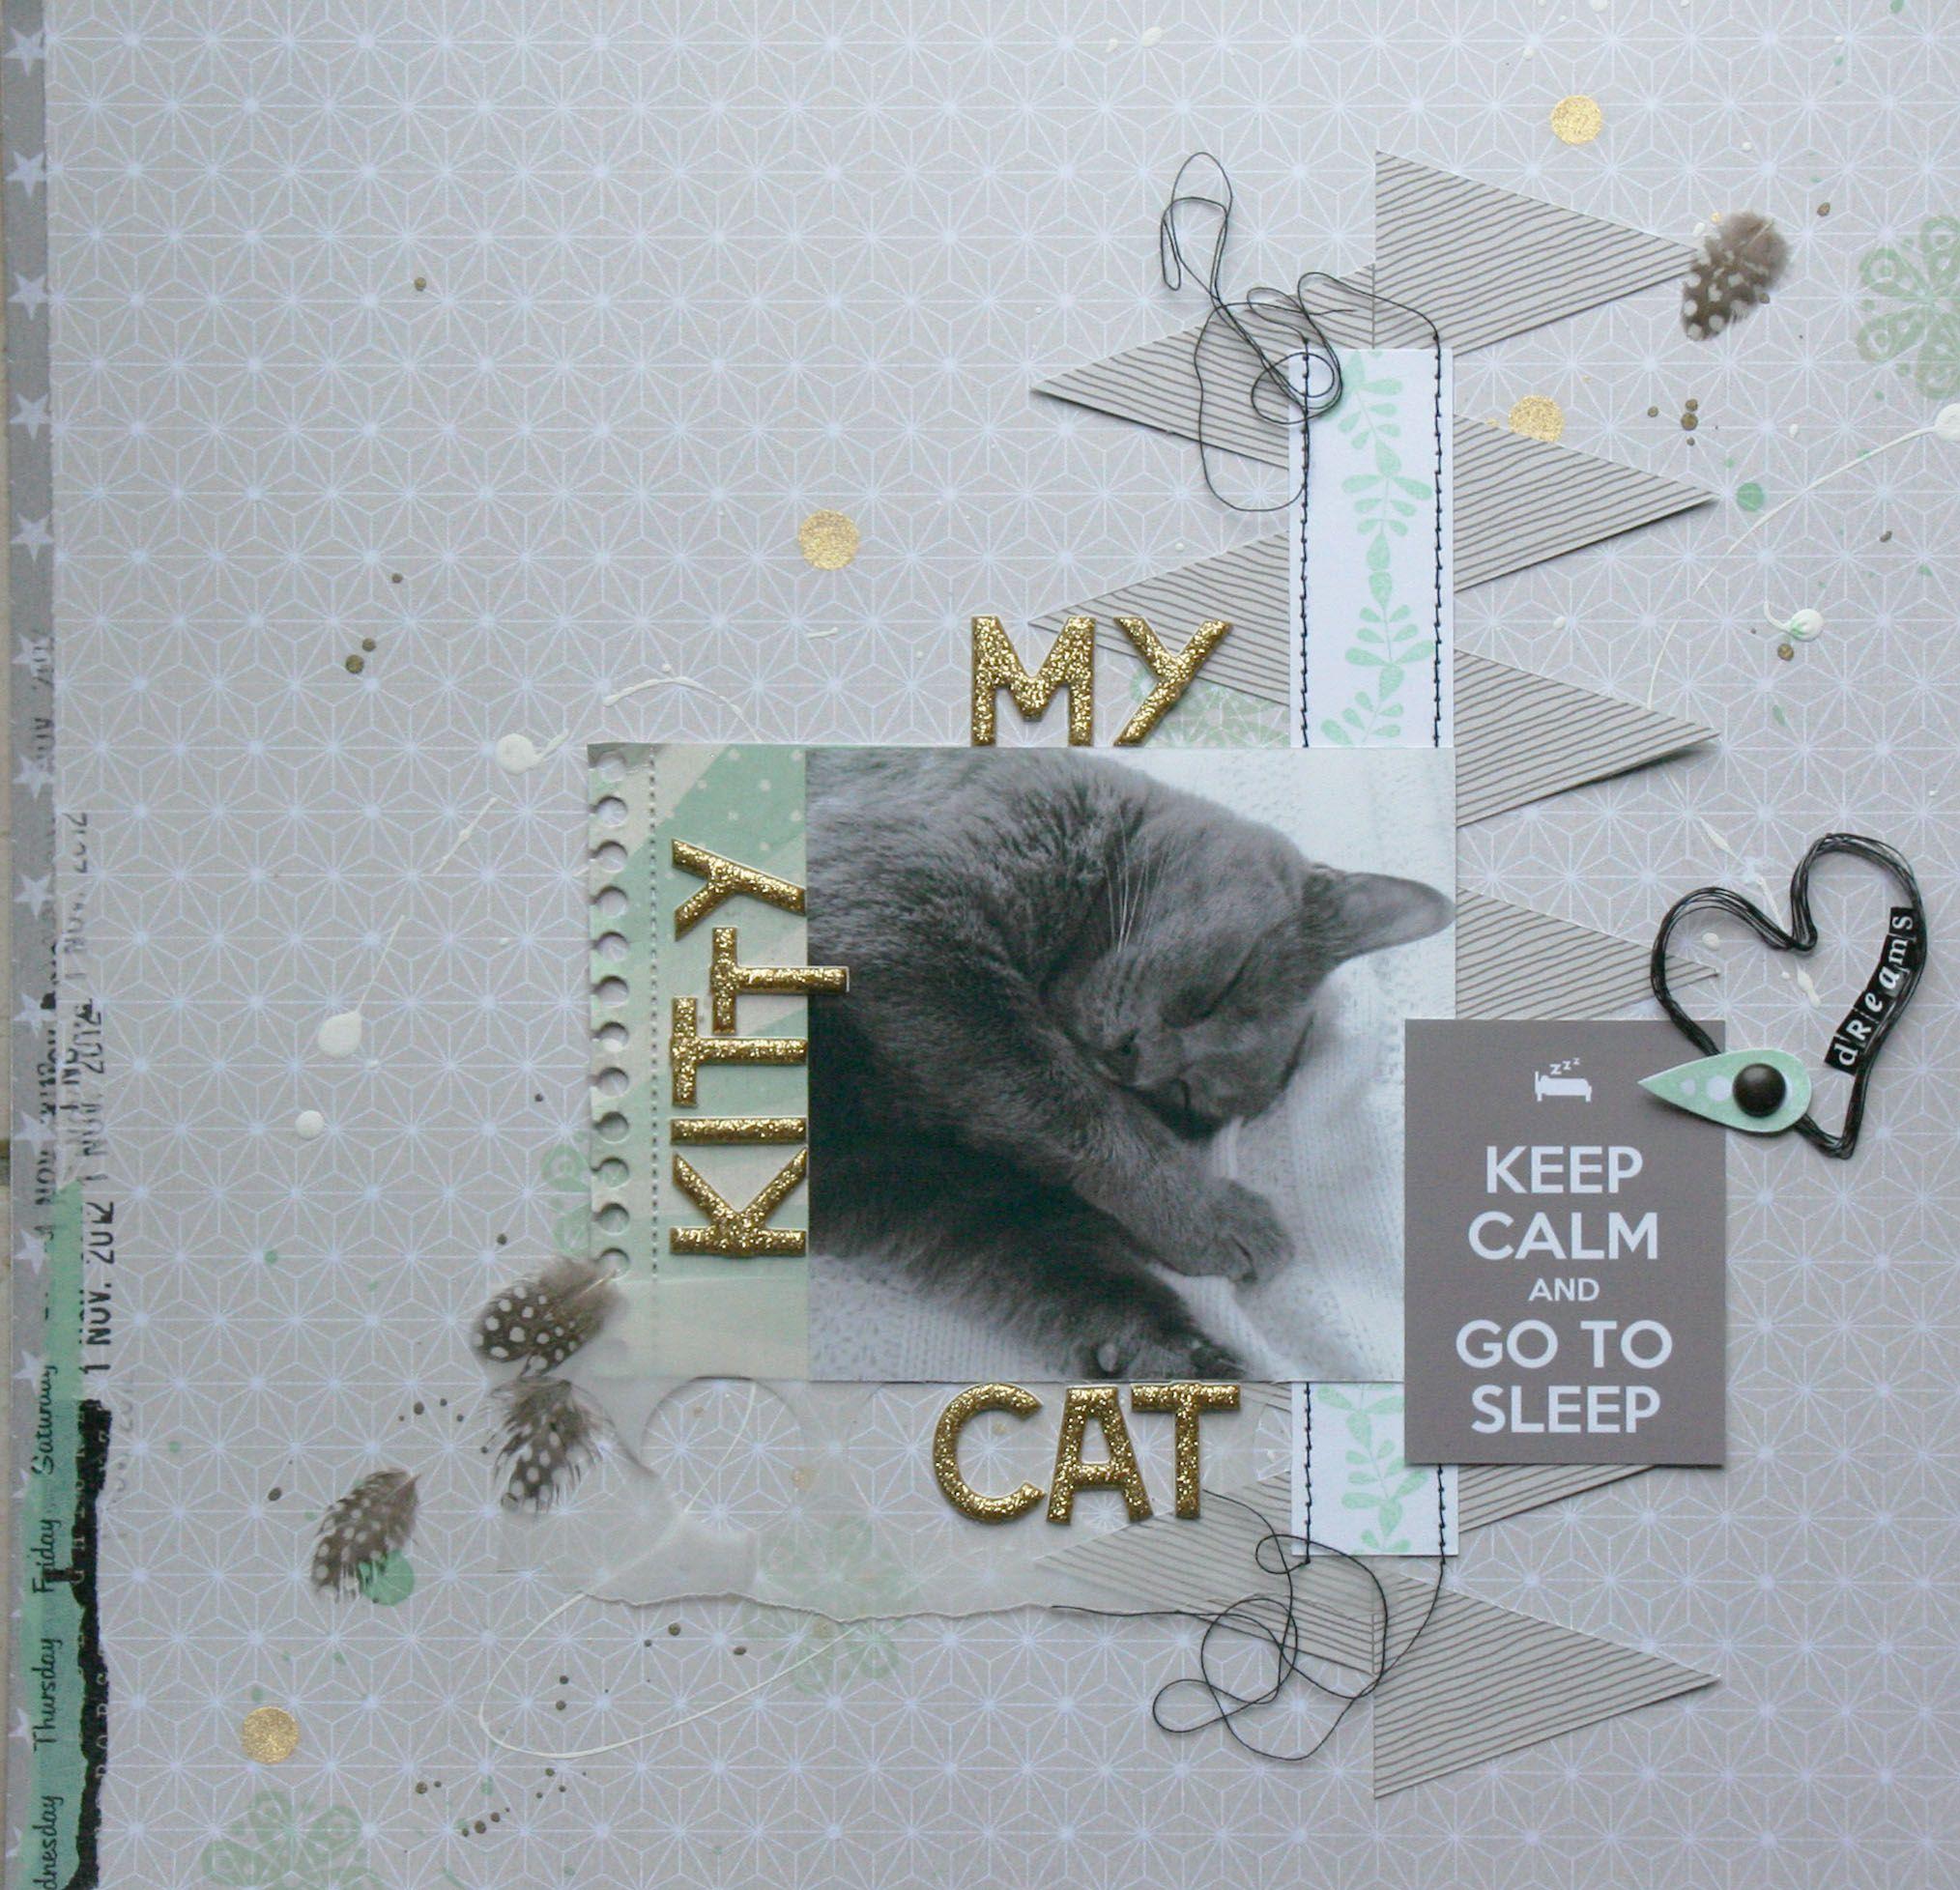 My Kitty Cat Scrapbook Scrapbooking And Cross Stitch